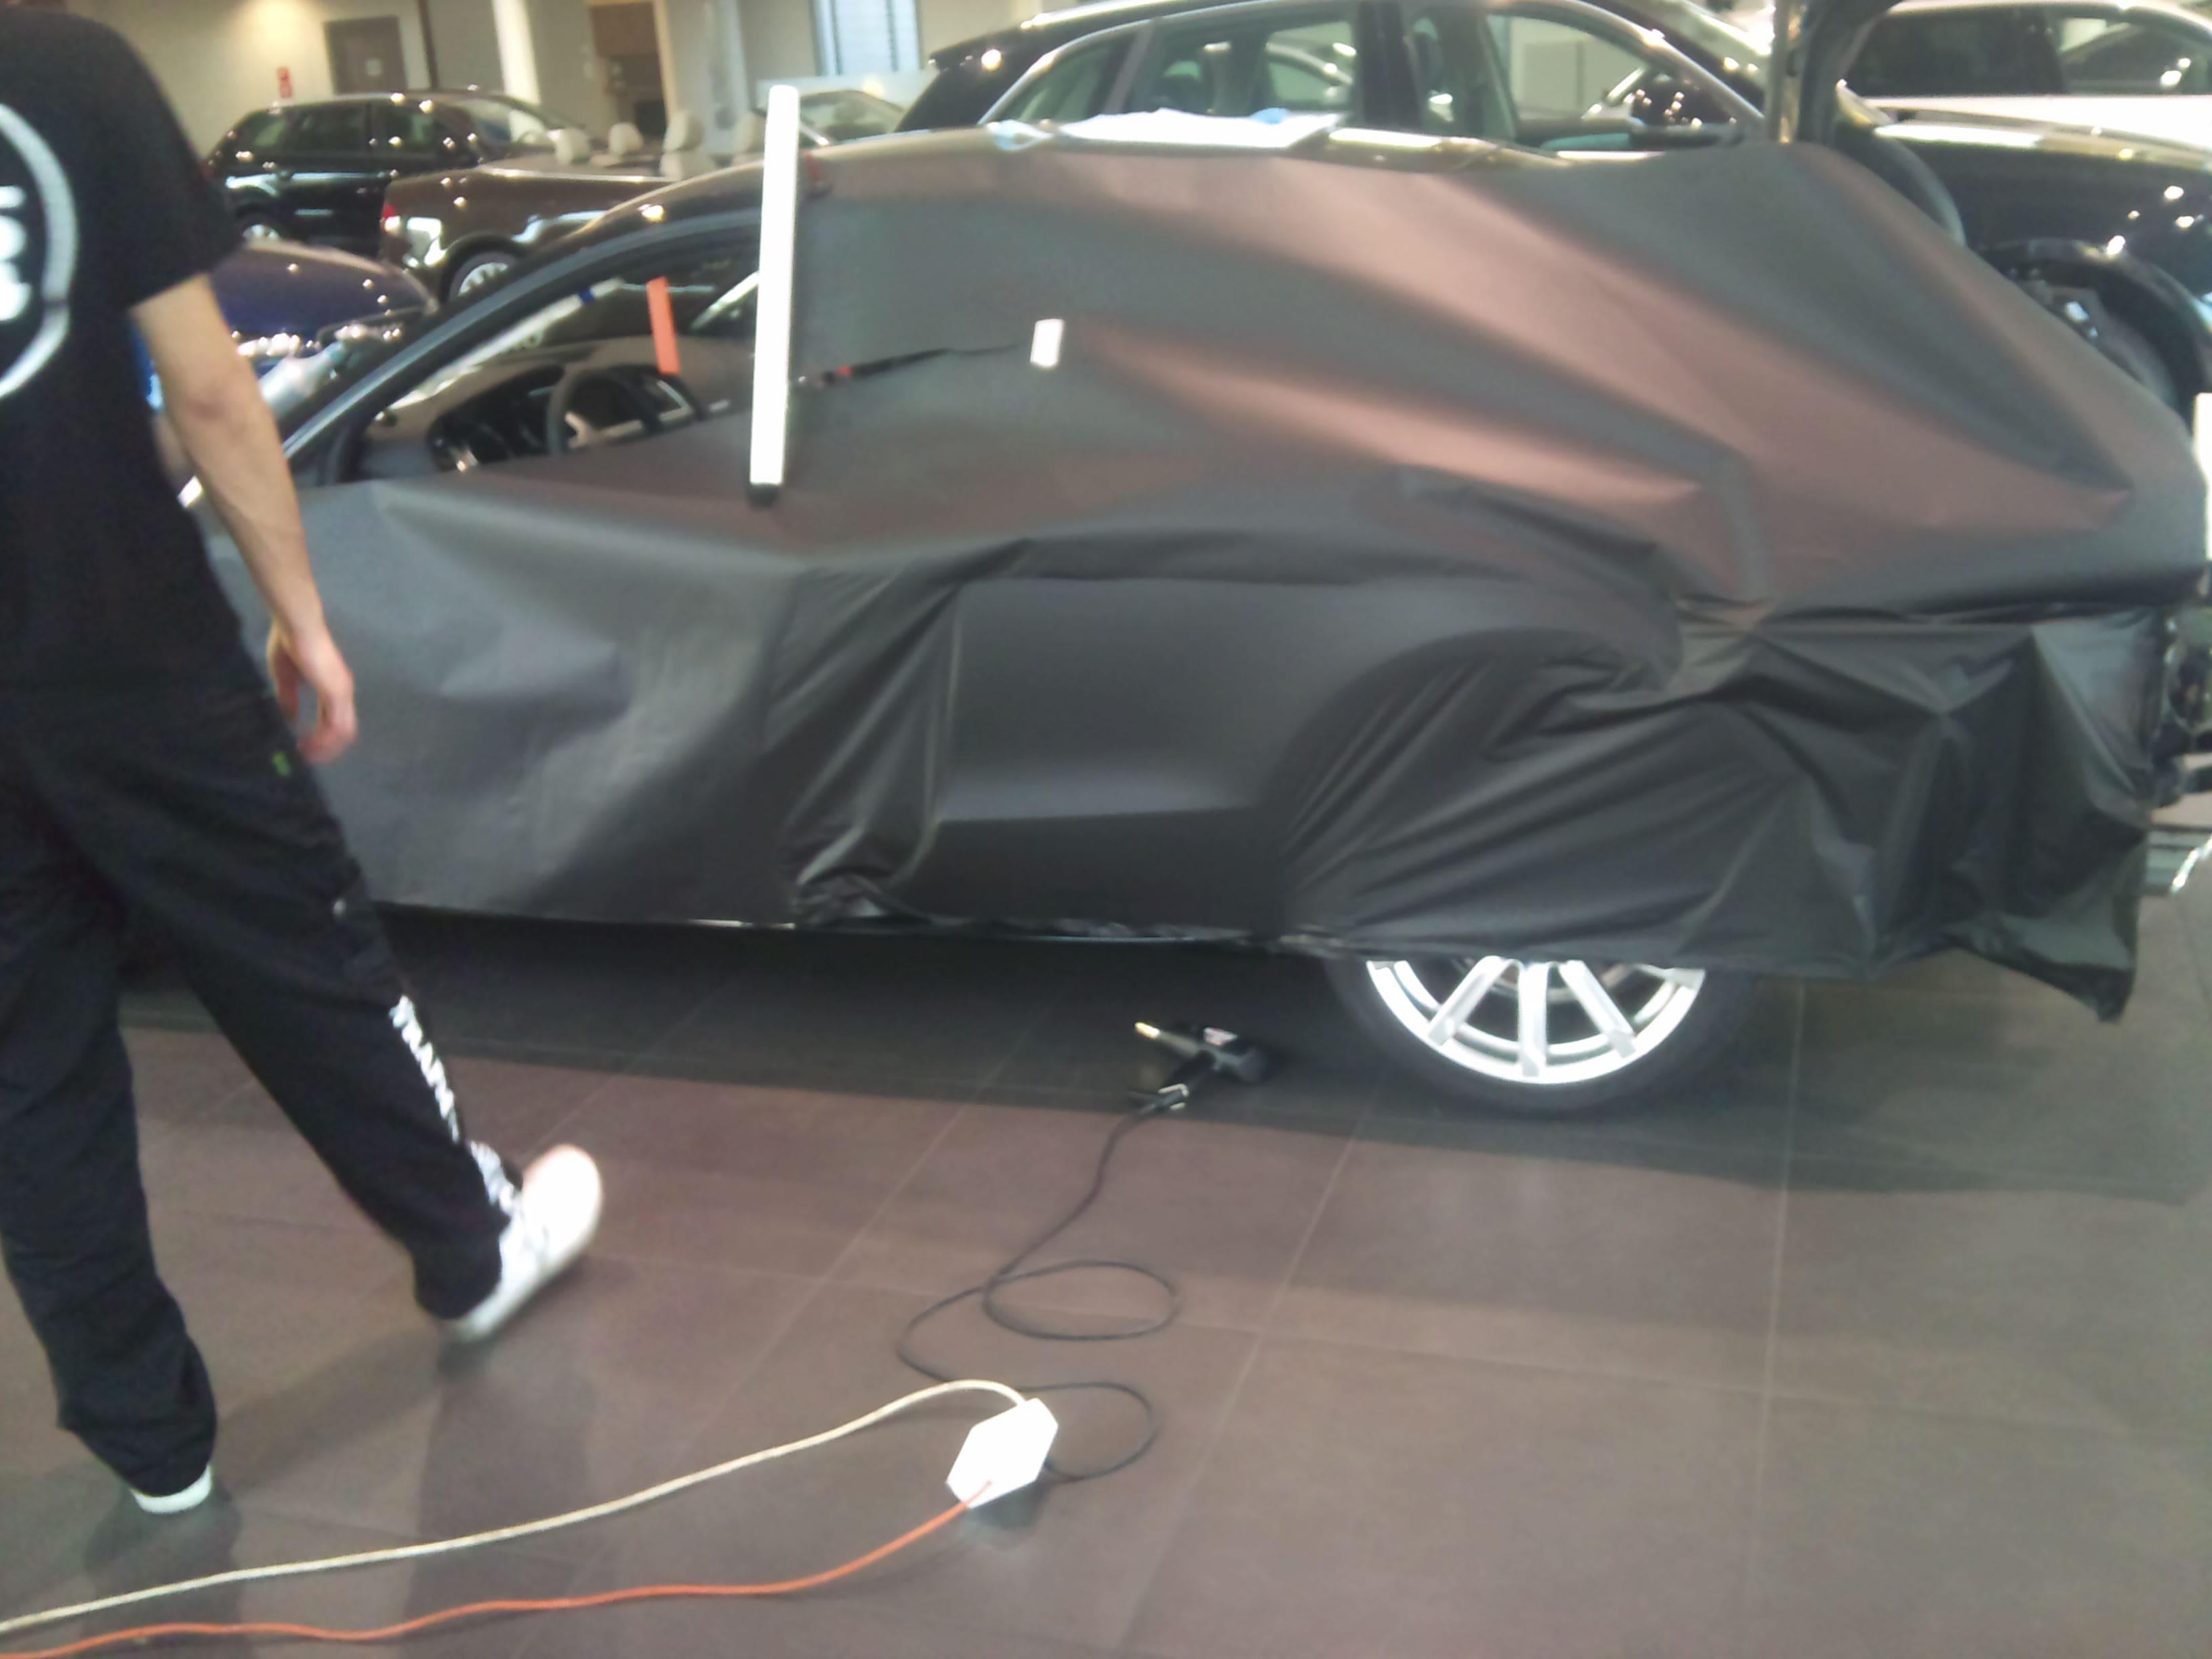 Audi A5 Coupe met Mat Zwarte Wrap, Carwrapping door Wrapmyride.nu Foto-nr:4559, ©2021